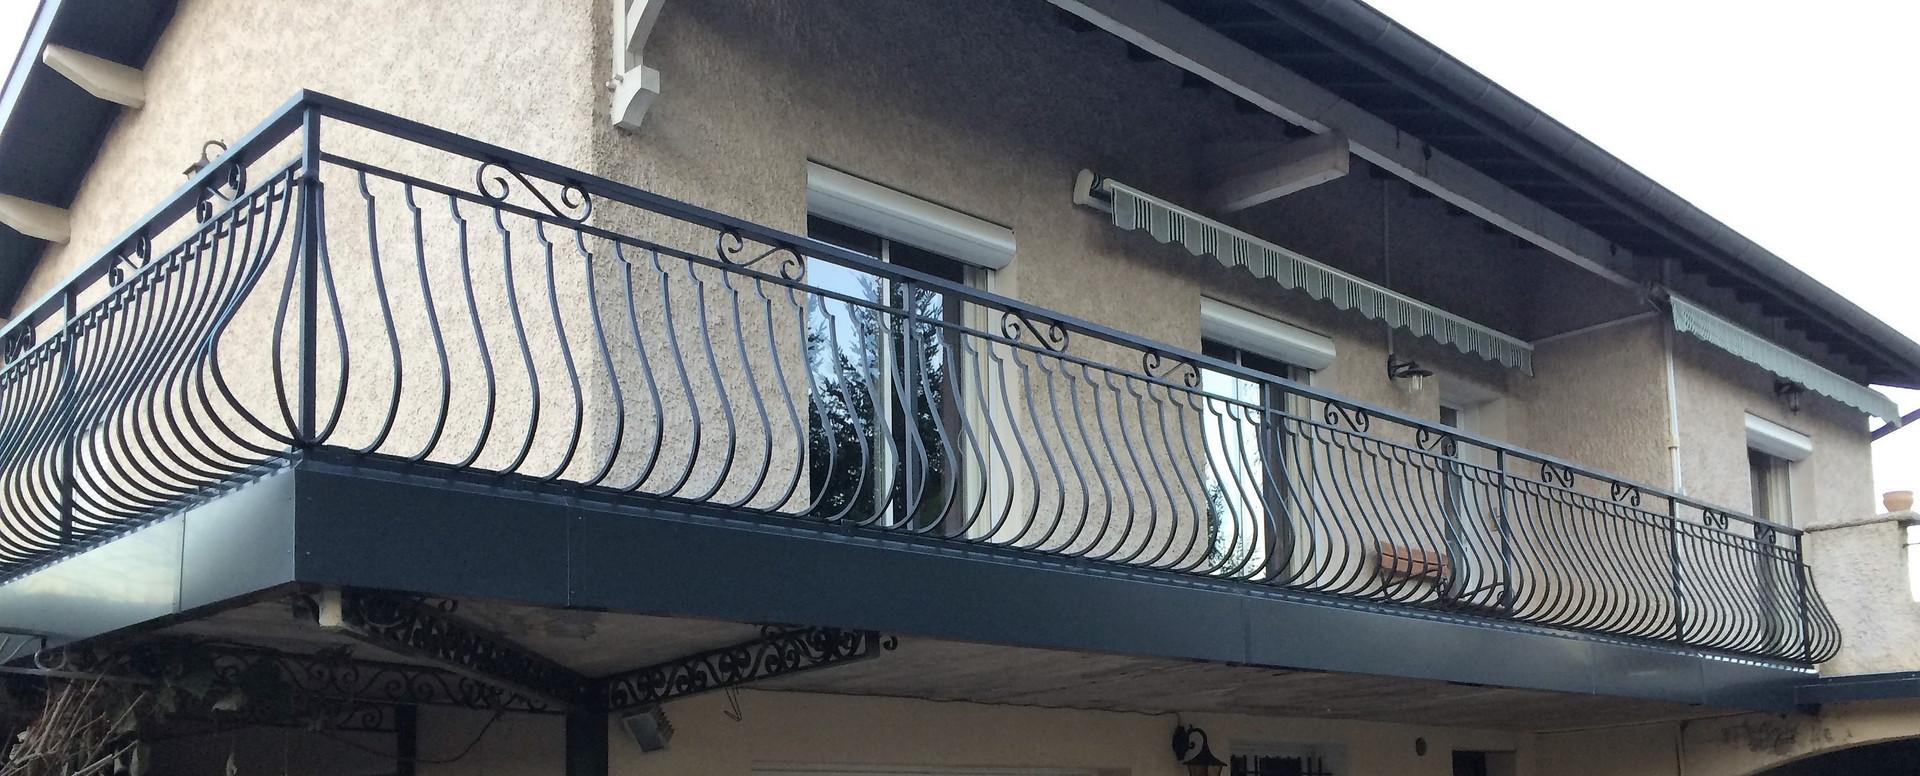 Habillage métallique balcon étanchéité